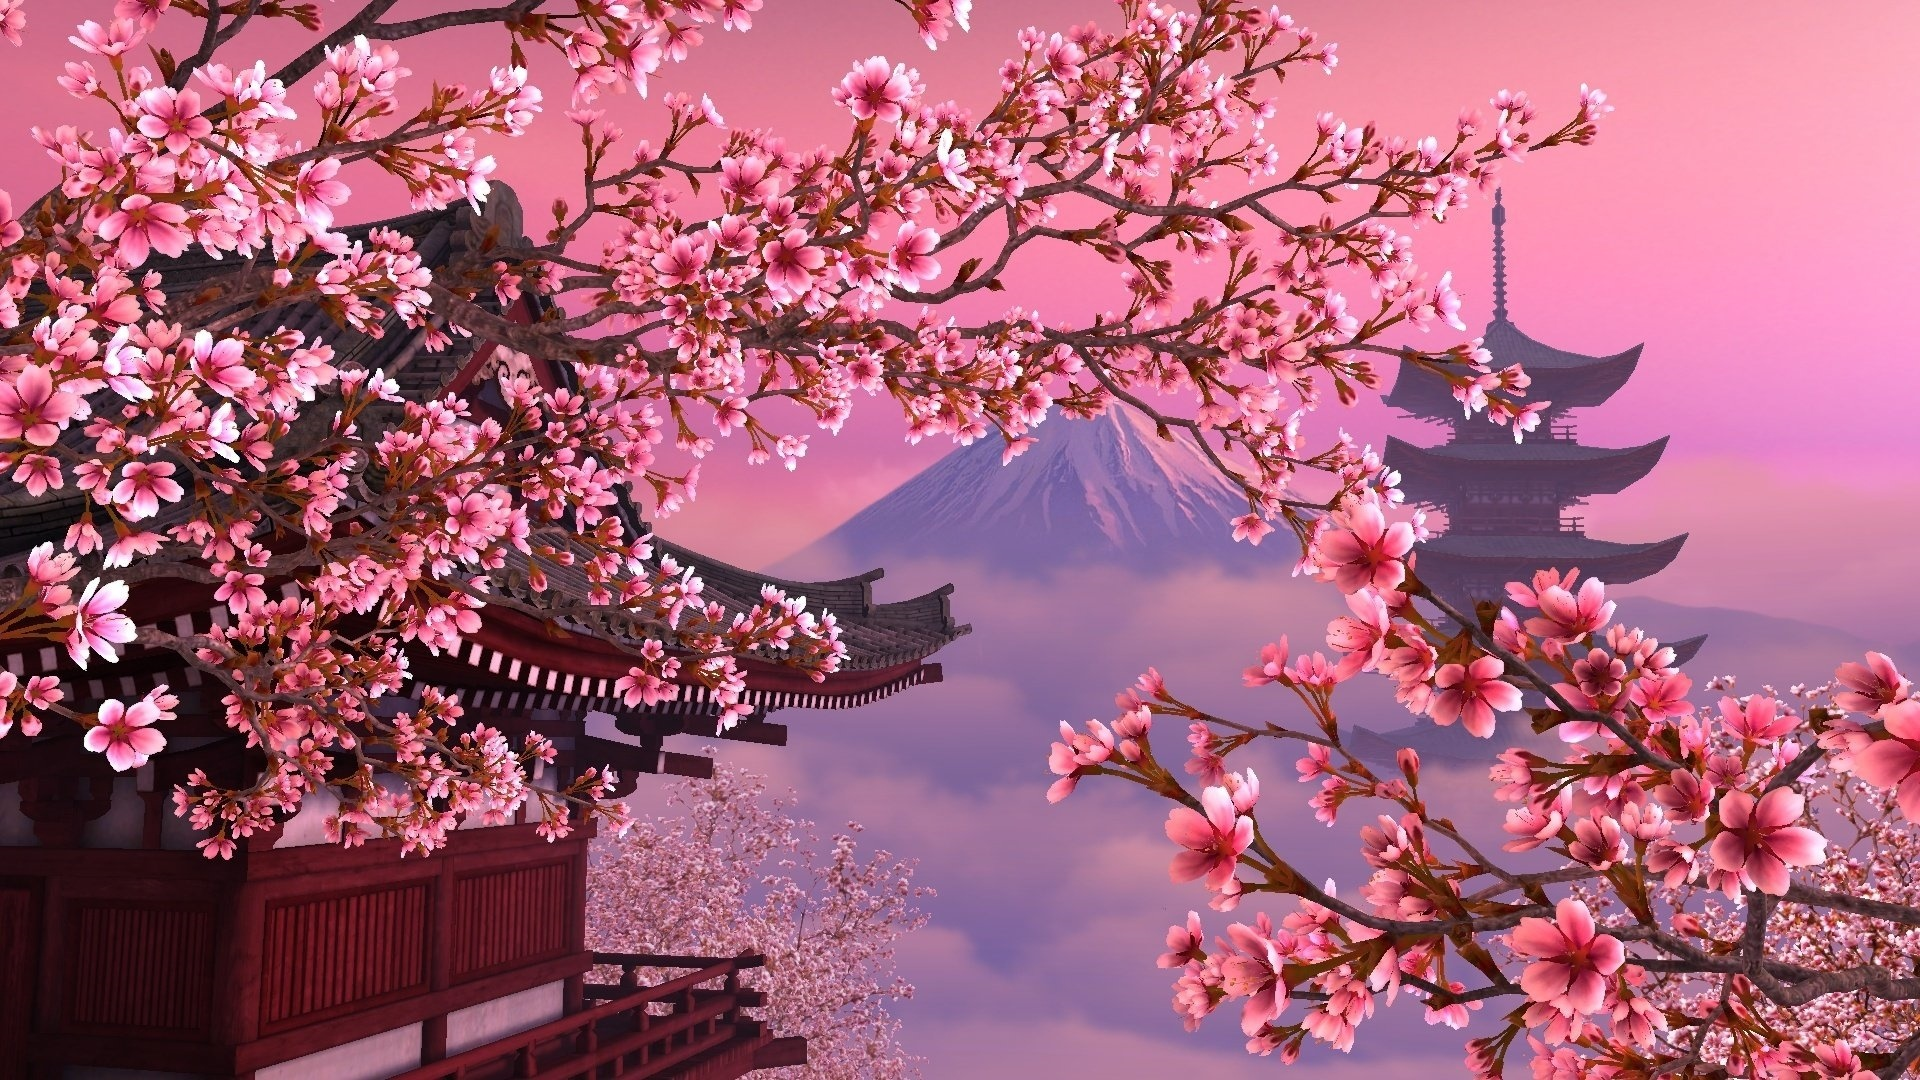 Sakura Blossom wallpaper for desktop